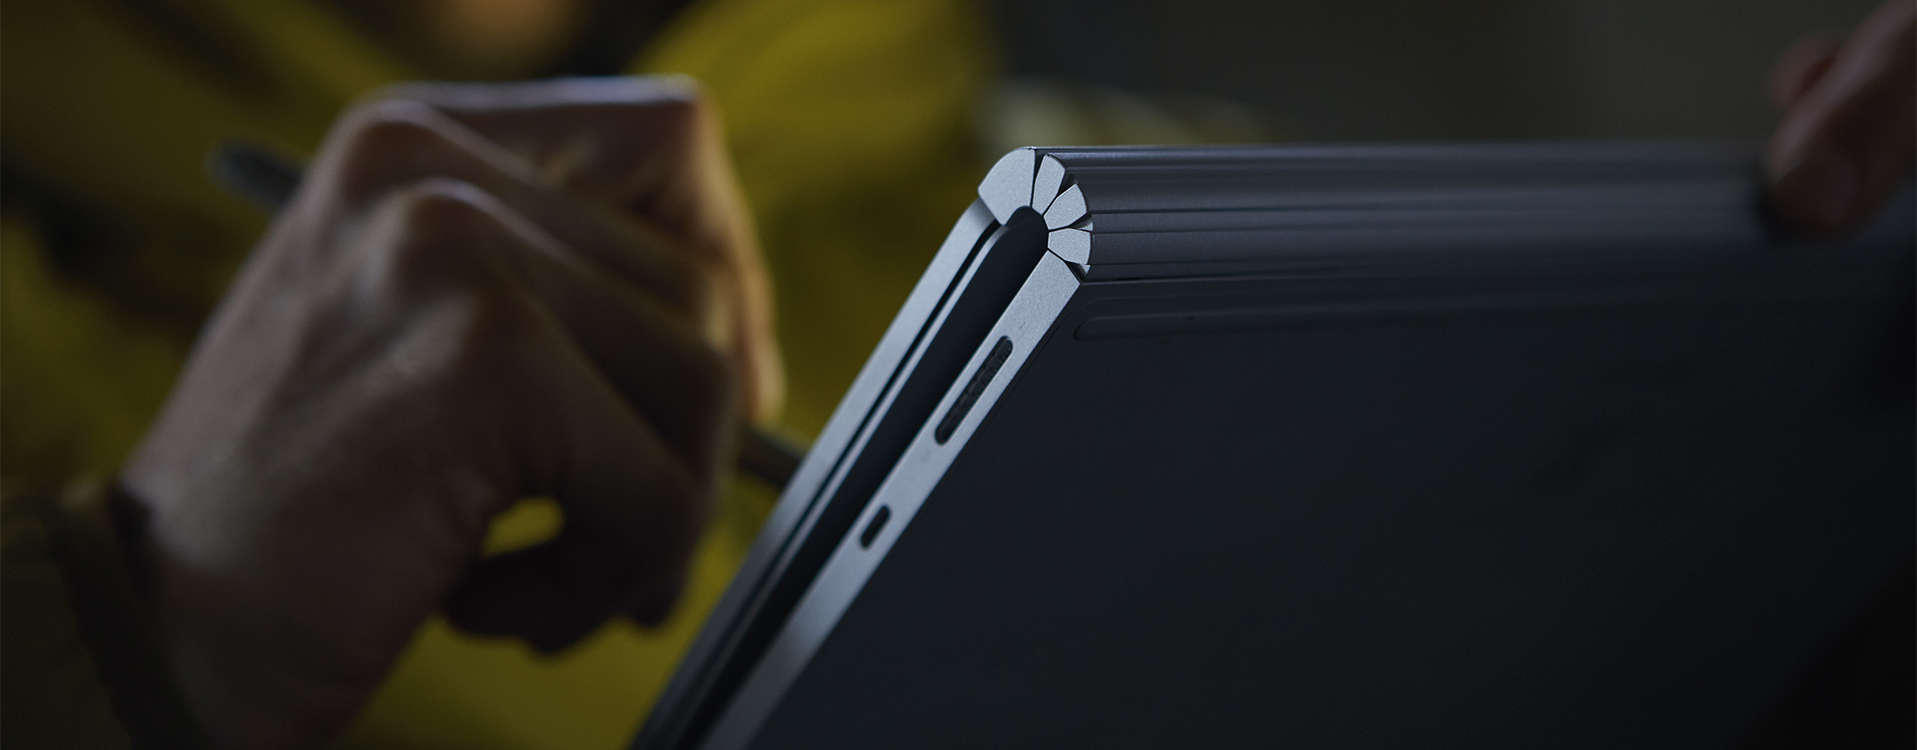 Microsoft Surface Book 2, i7, 16 GB, 512 GB SSD, GTX 1060 6 GB ...